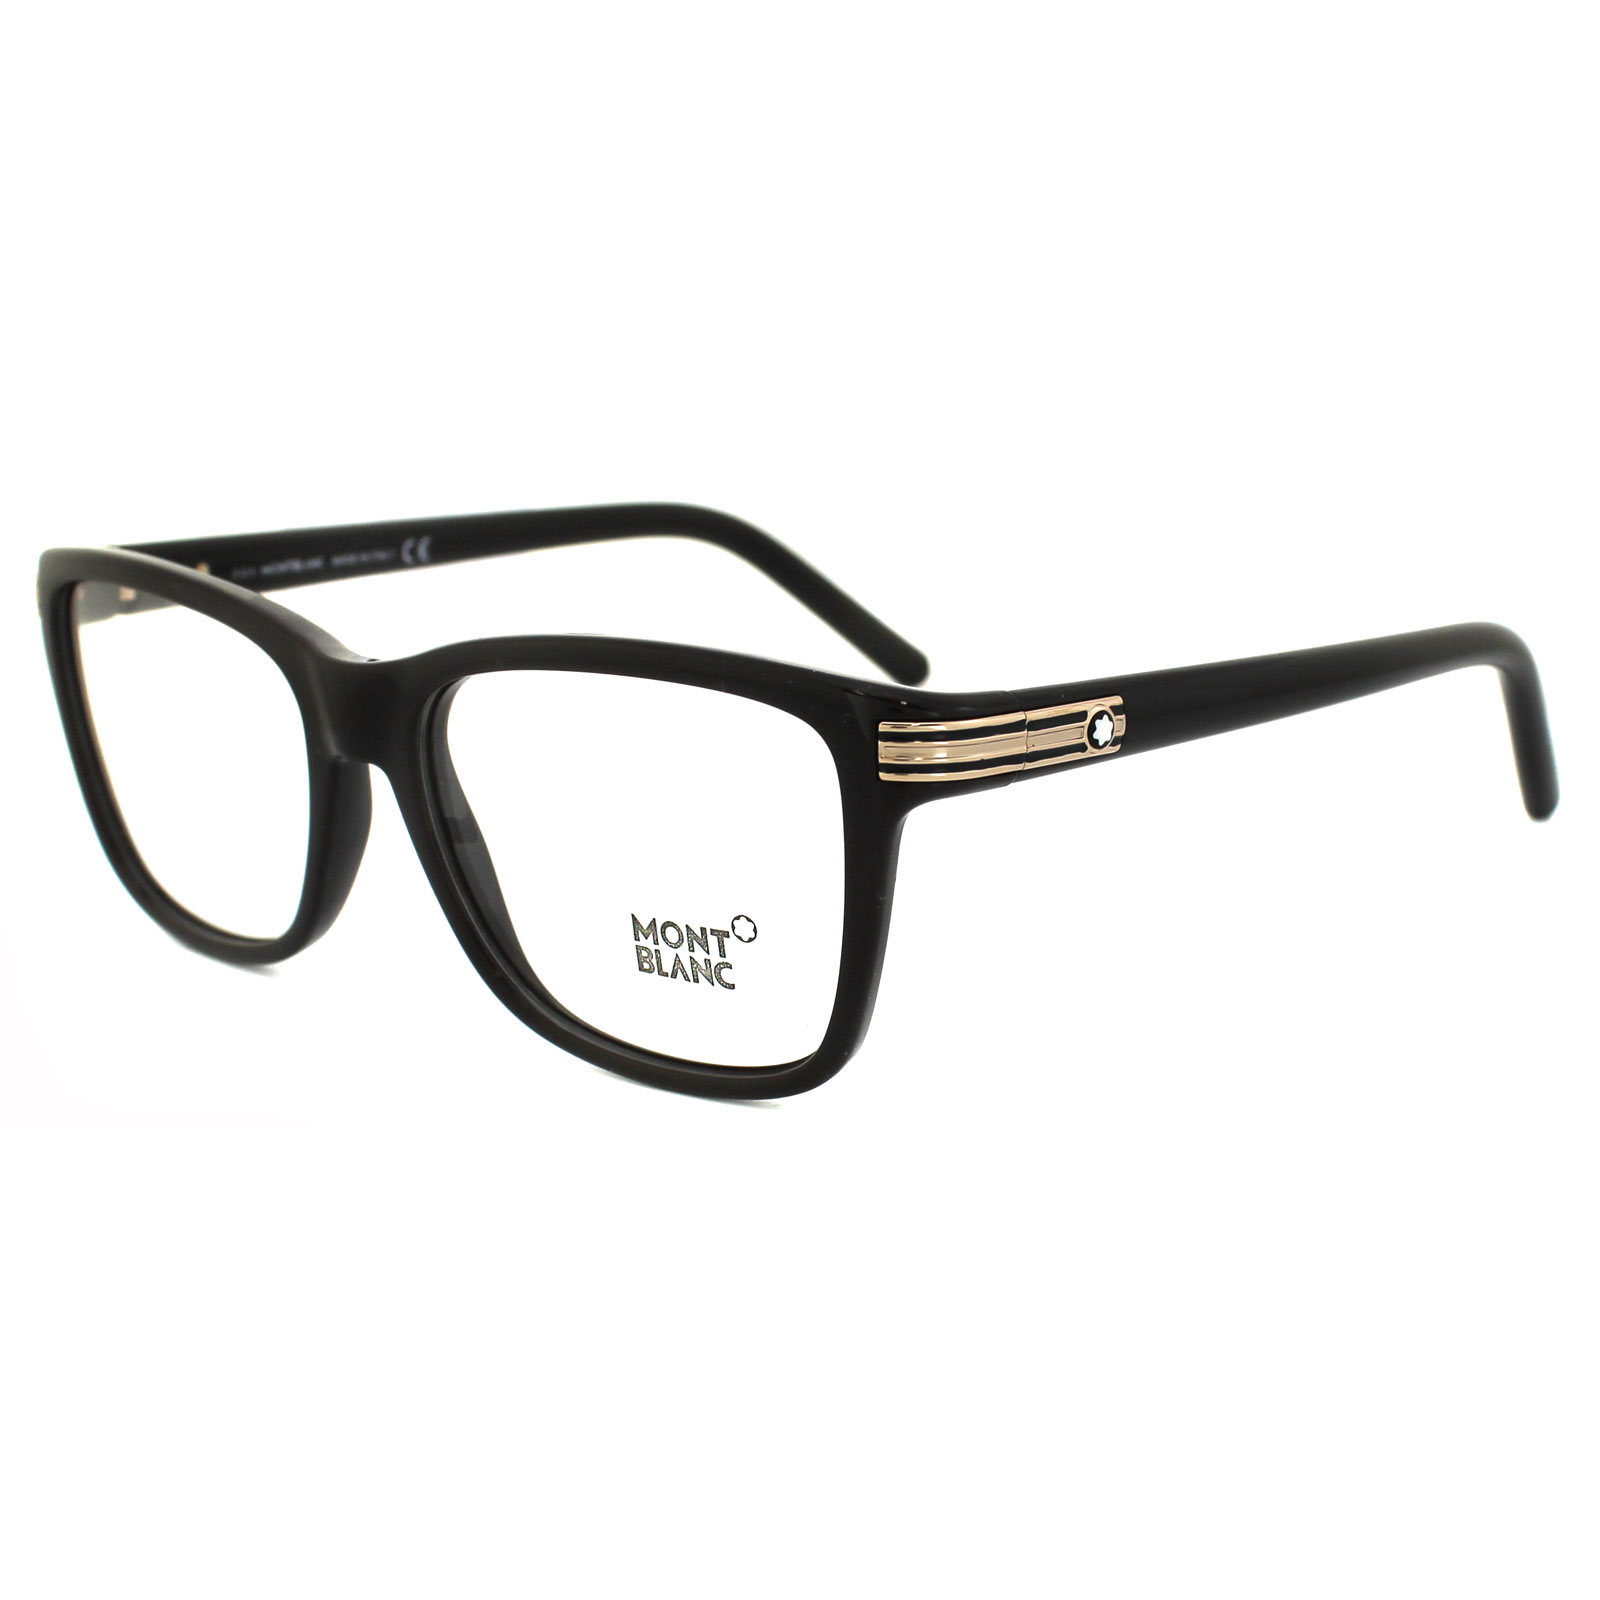 f66c4e18b68 Mont Blanc Glasses Frames Mb0477 005 Black Gold 664689622474